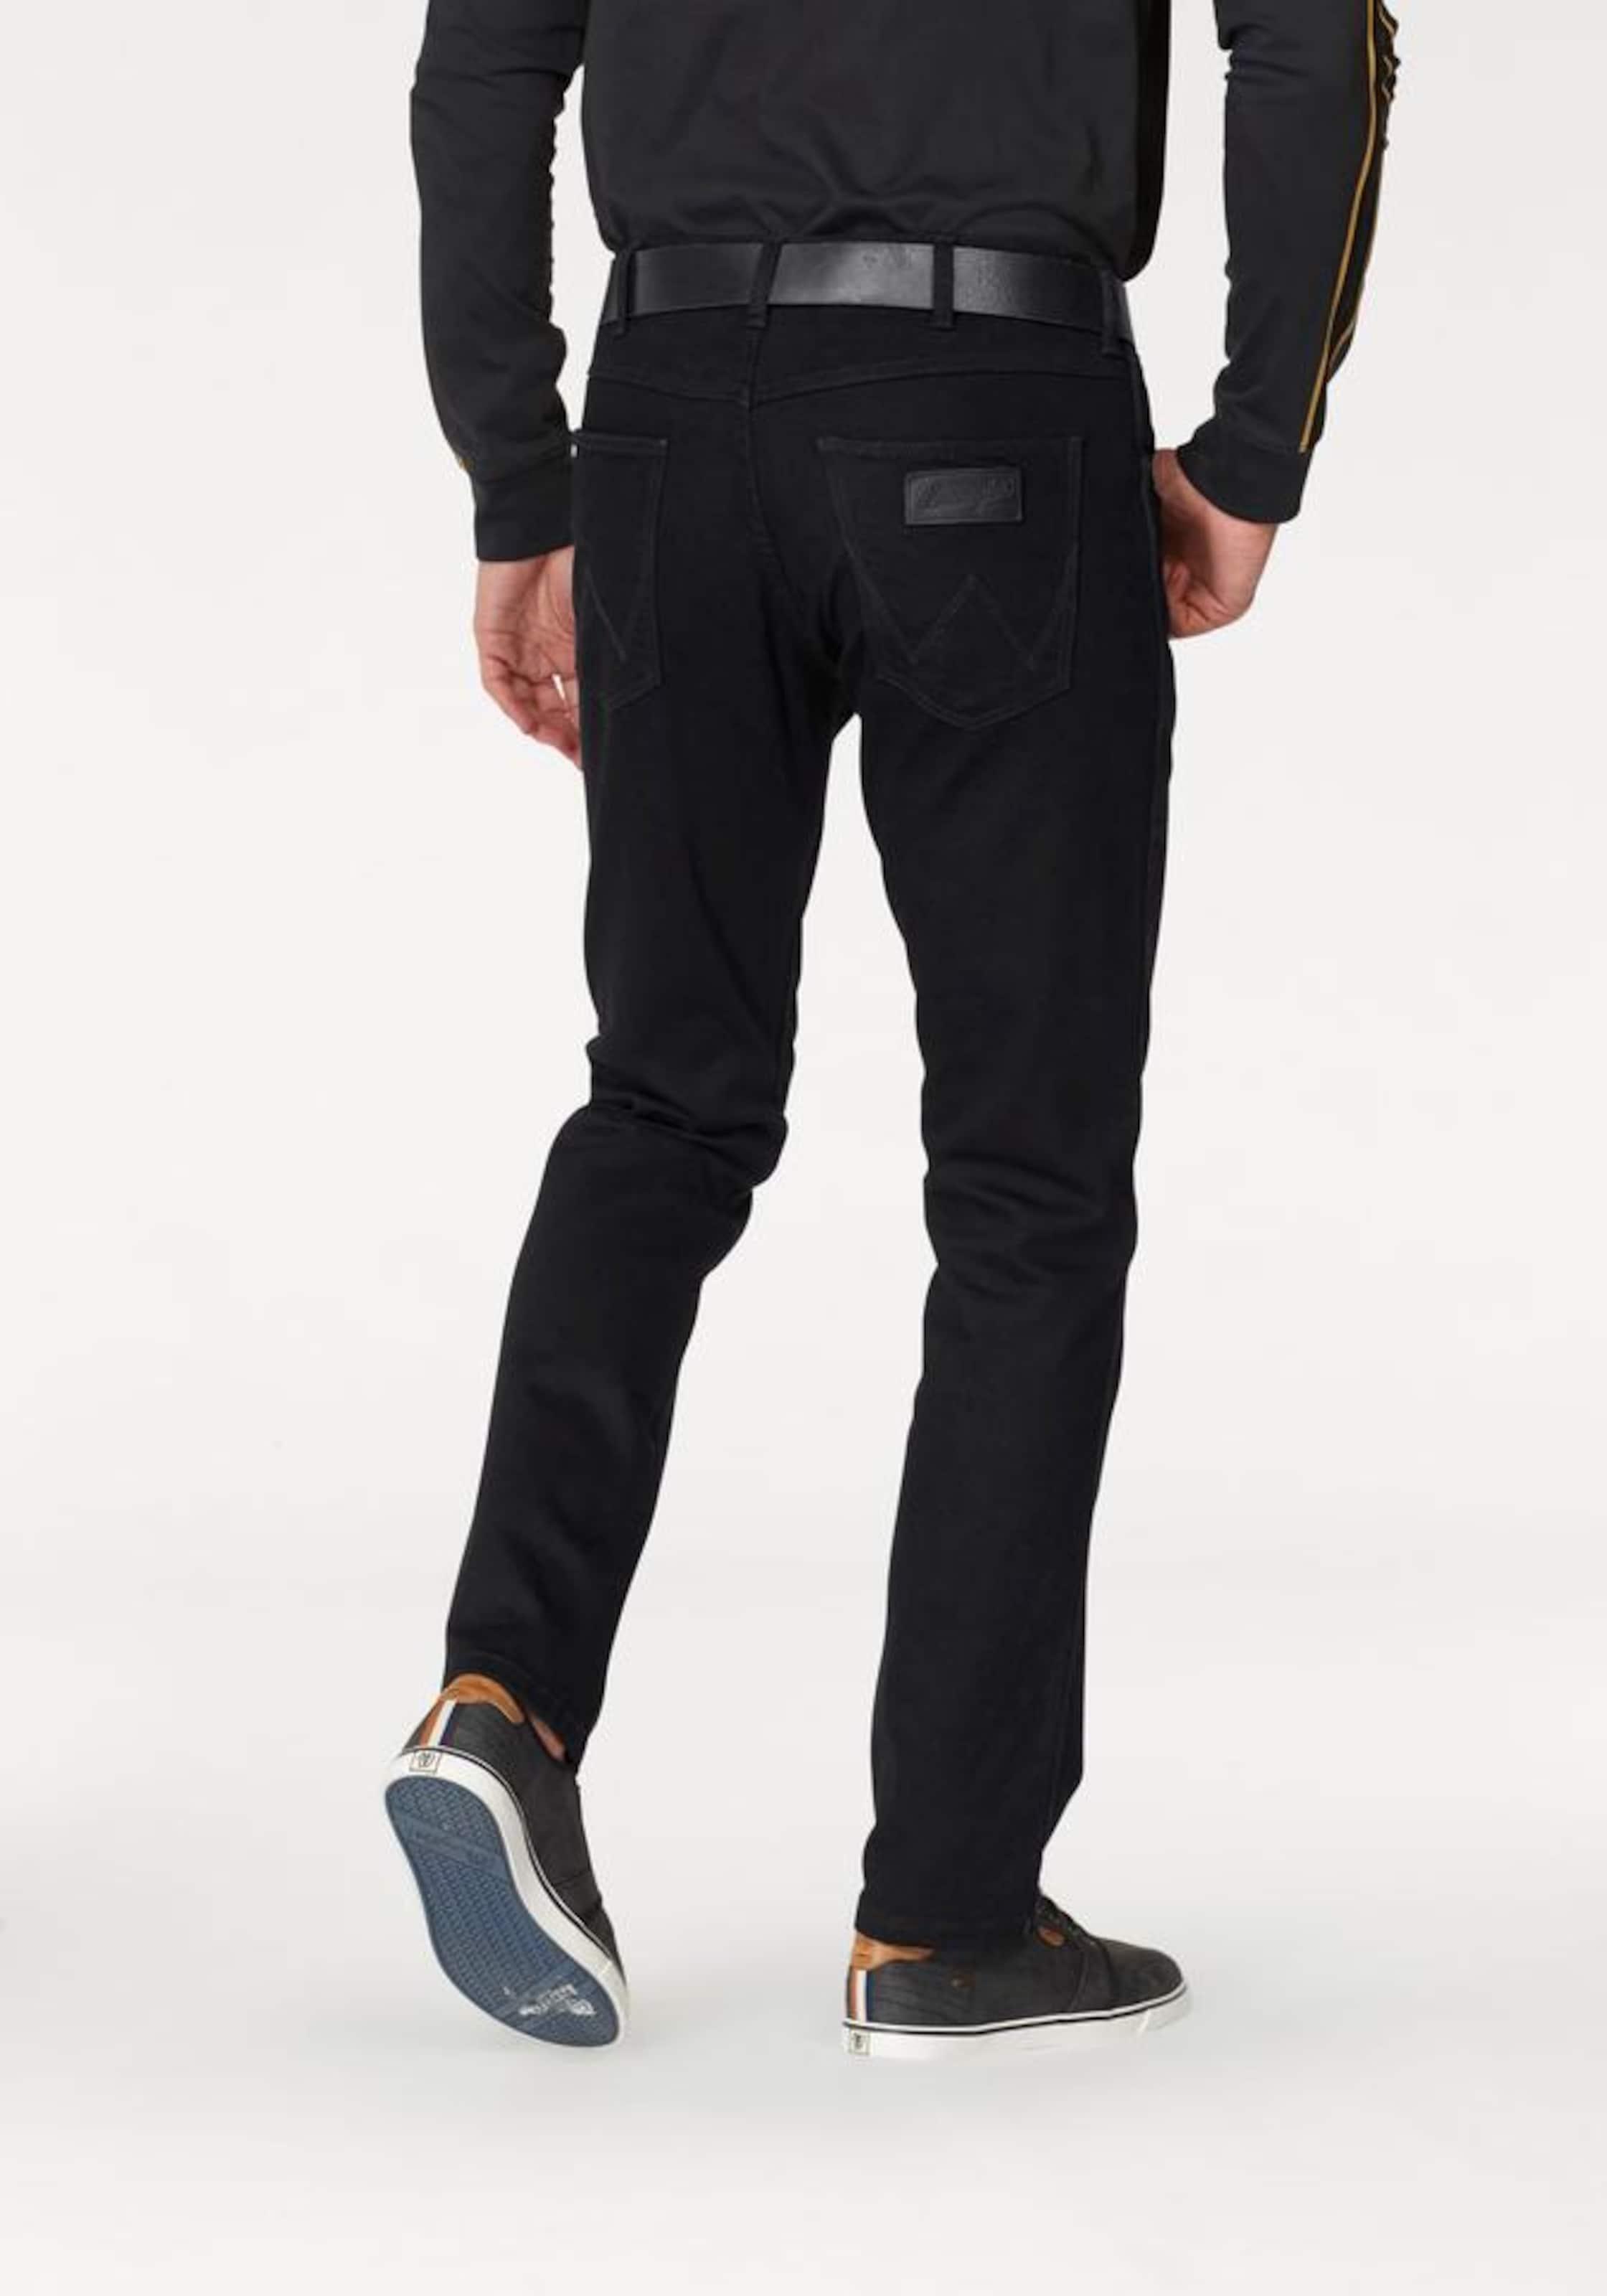 jeans 'greensboro' Stretch Schwarz In Wrangler y76bgYf